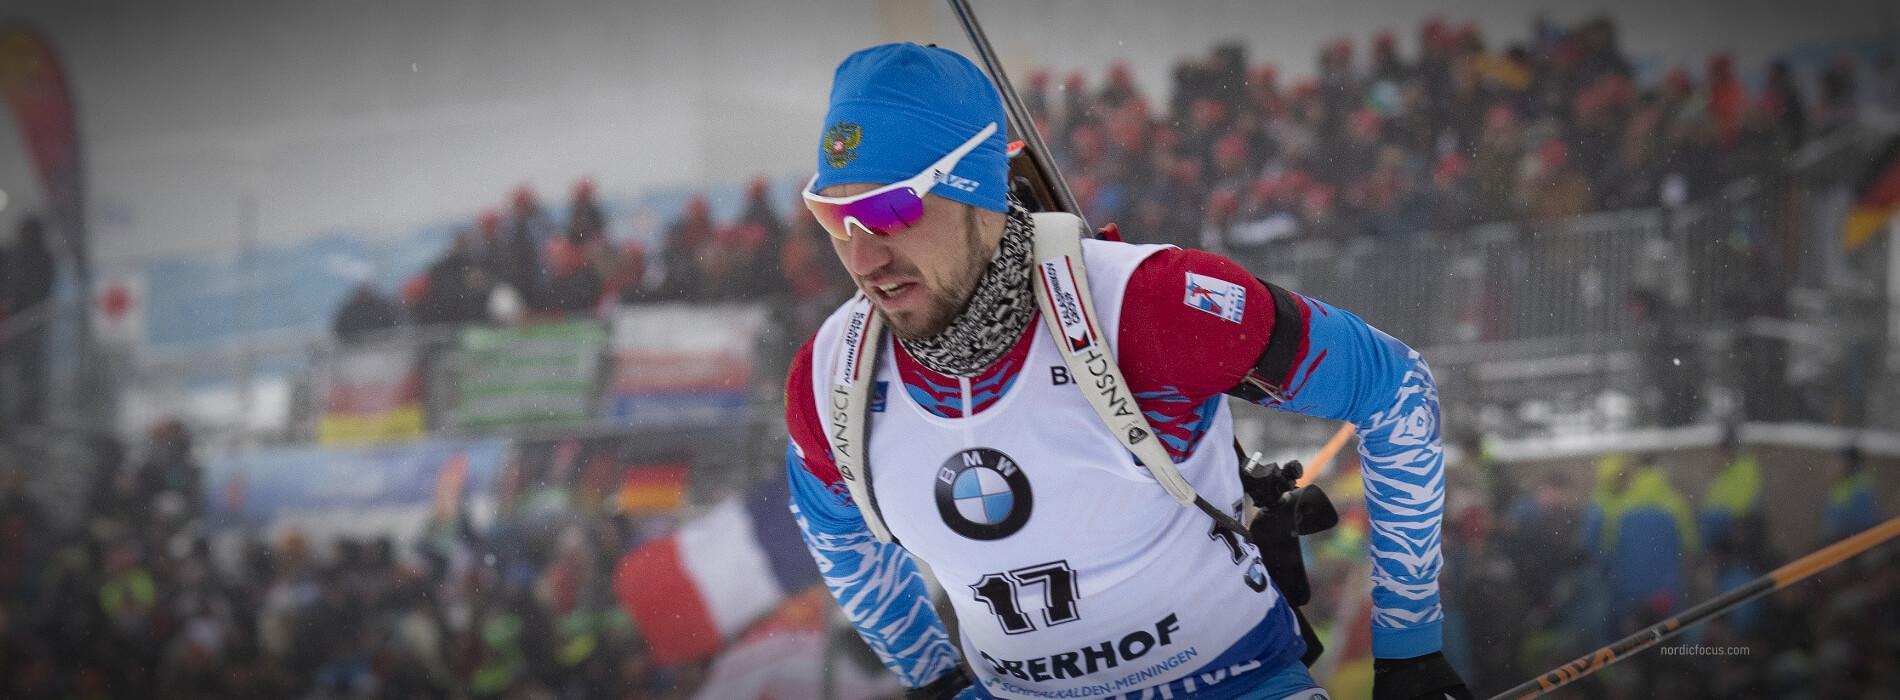 Biathlon Staffel Herren Oberhof